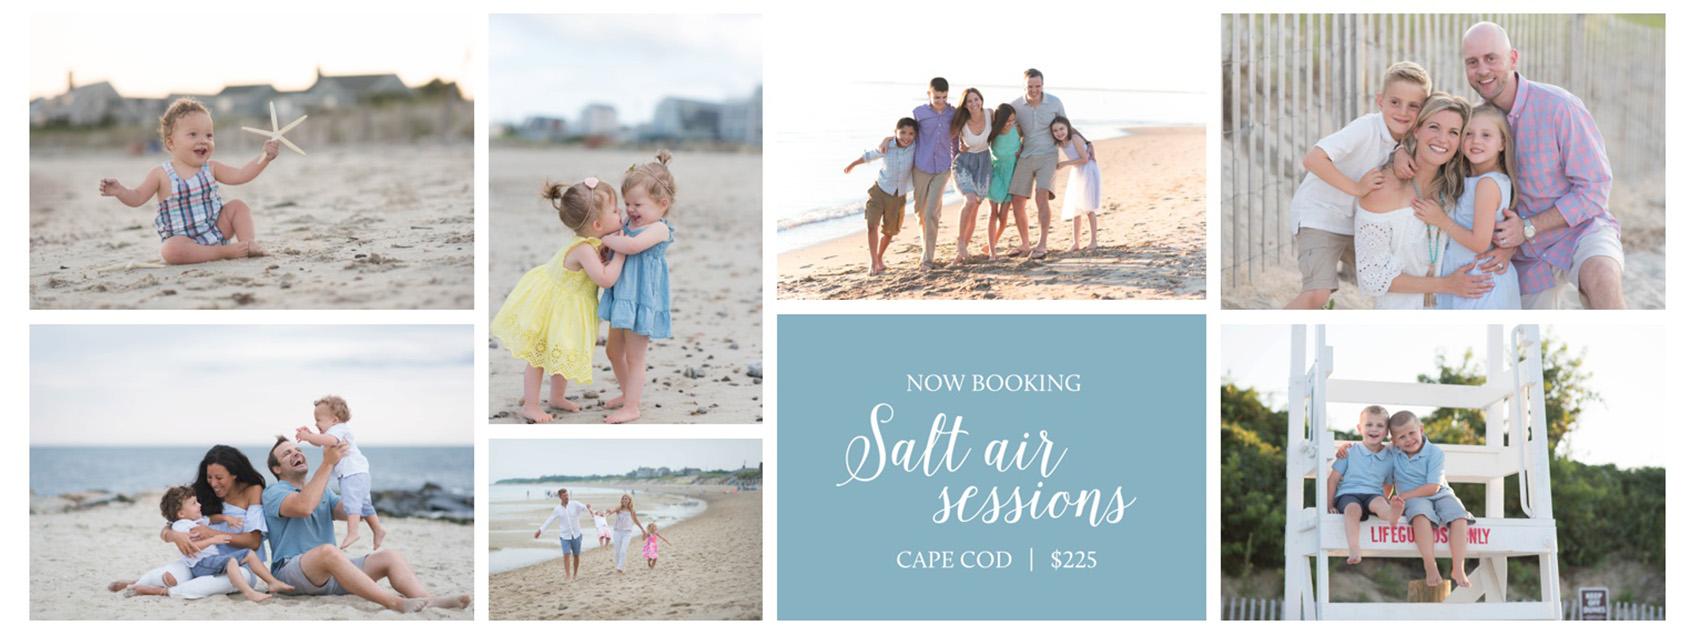 Cape Cod Family Photographer, Nicole Starr Photography, beach photo shoot on cape cod